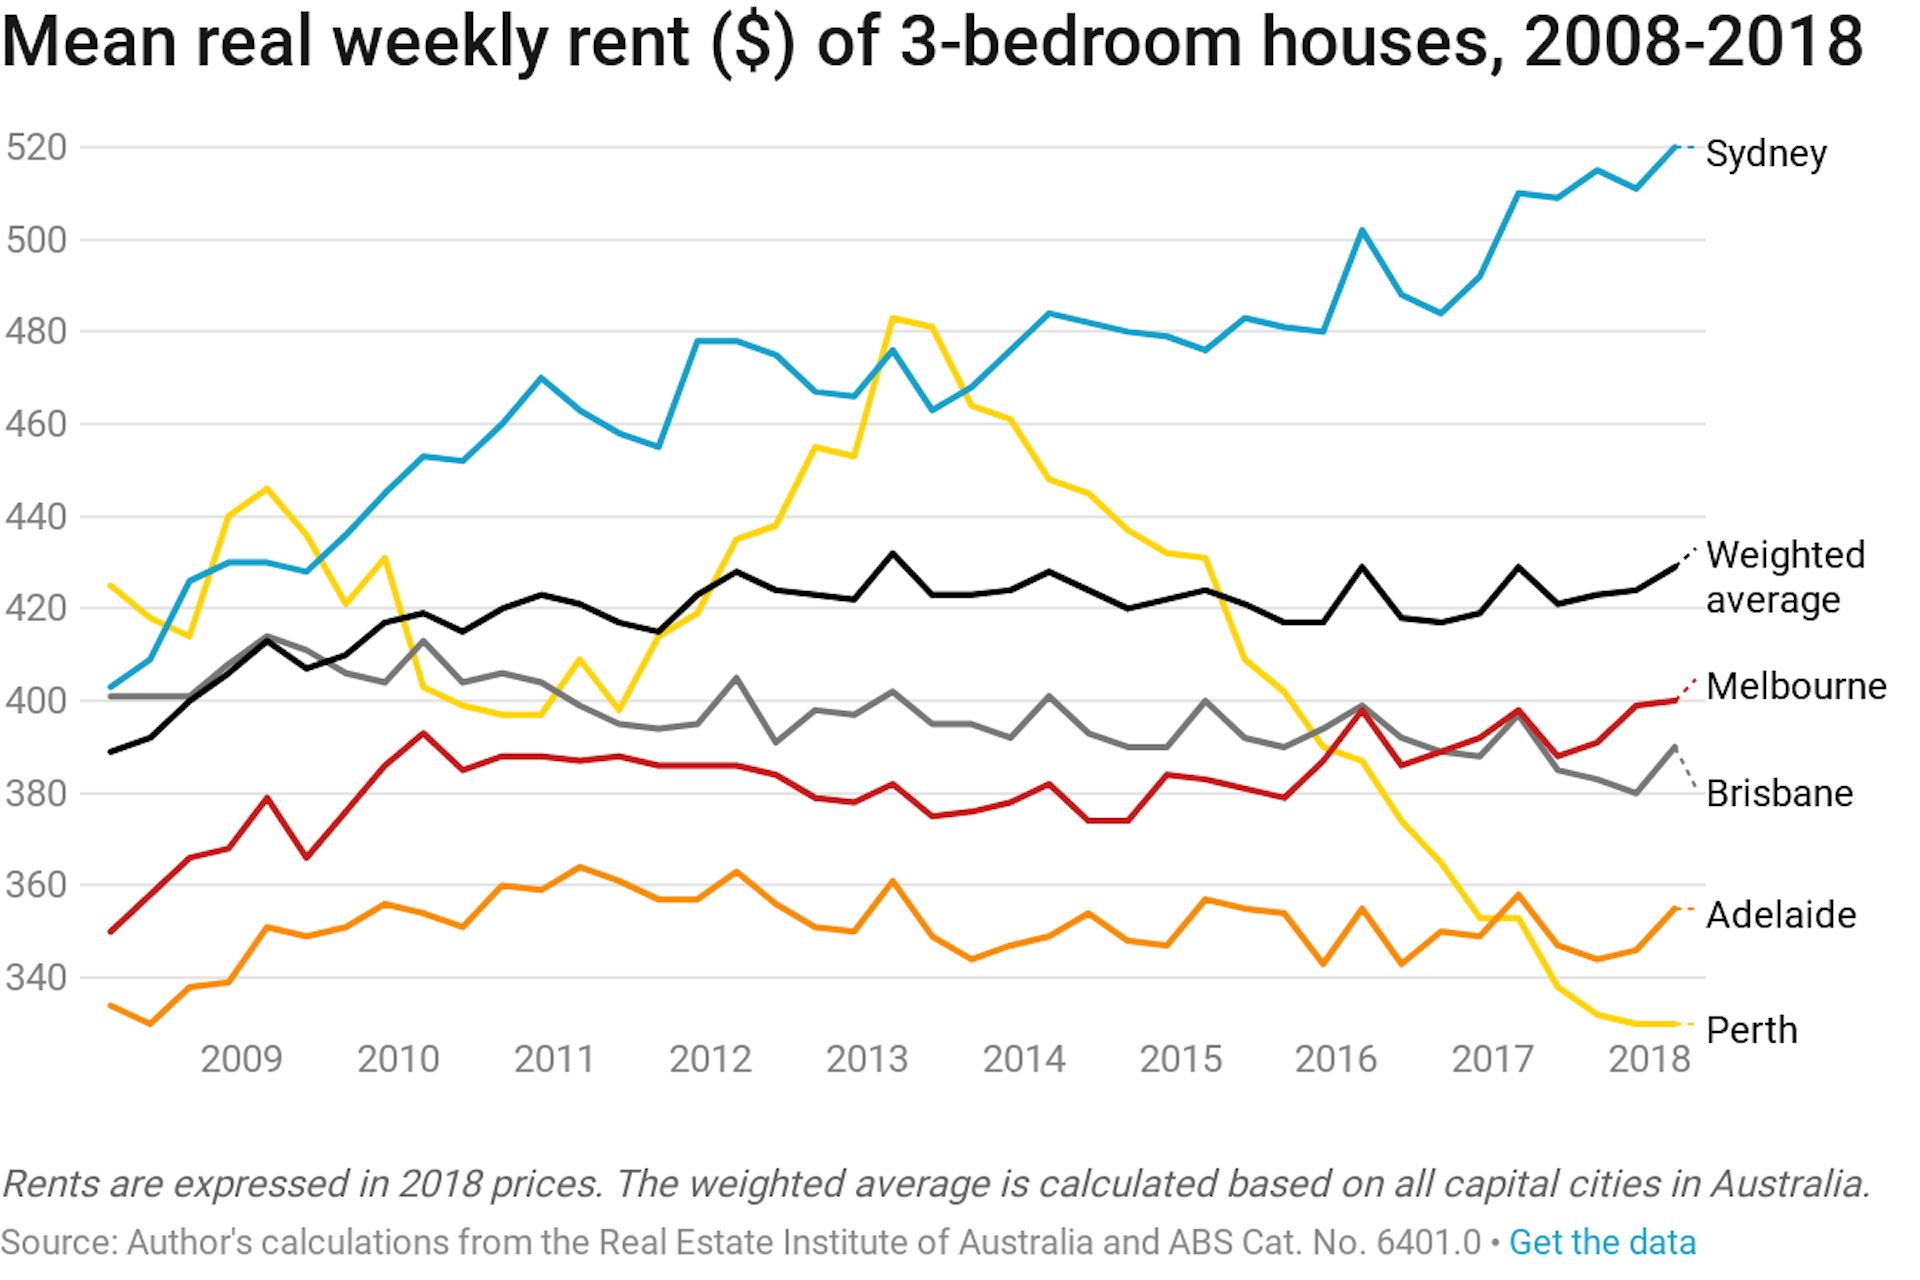 Mean real weekly rent of 3-bedroom houses in Australia